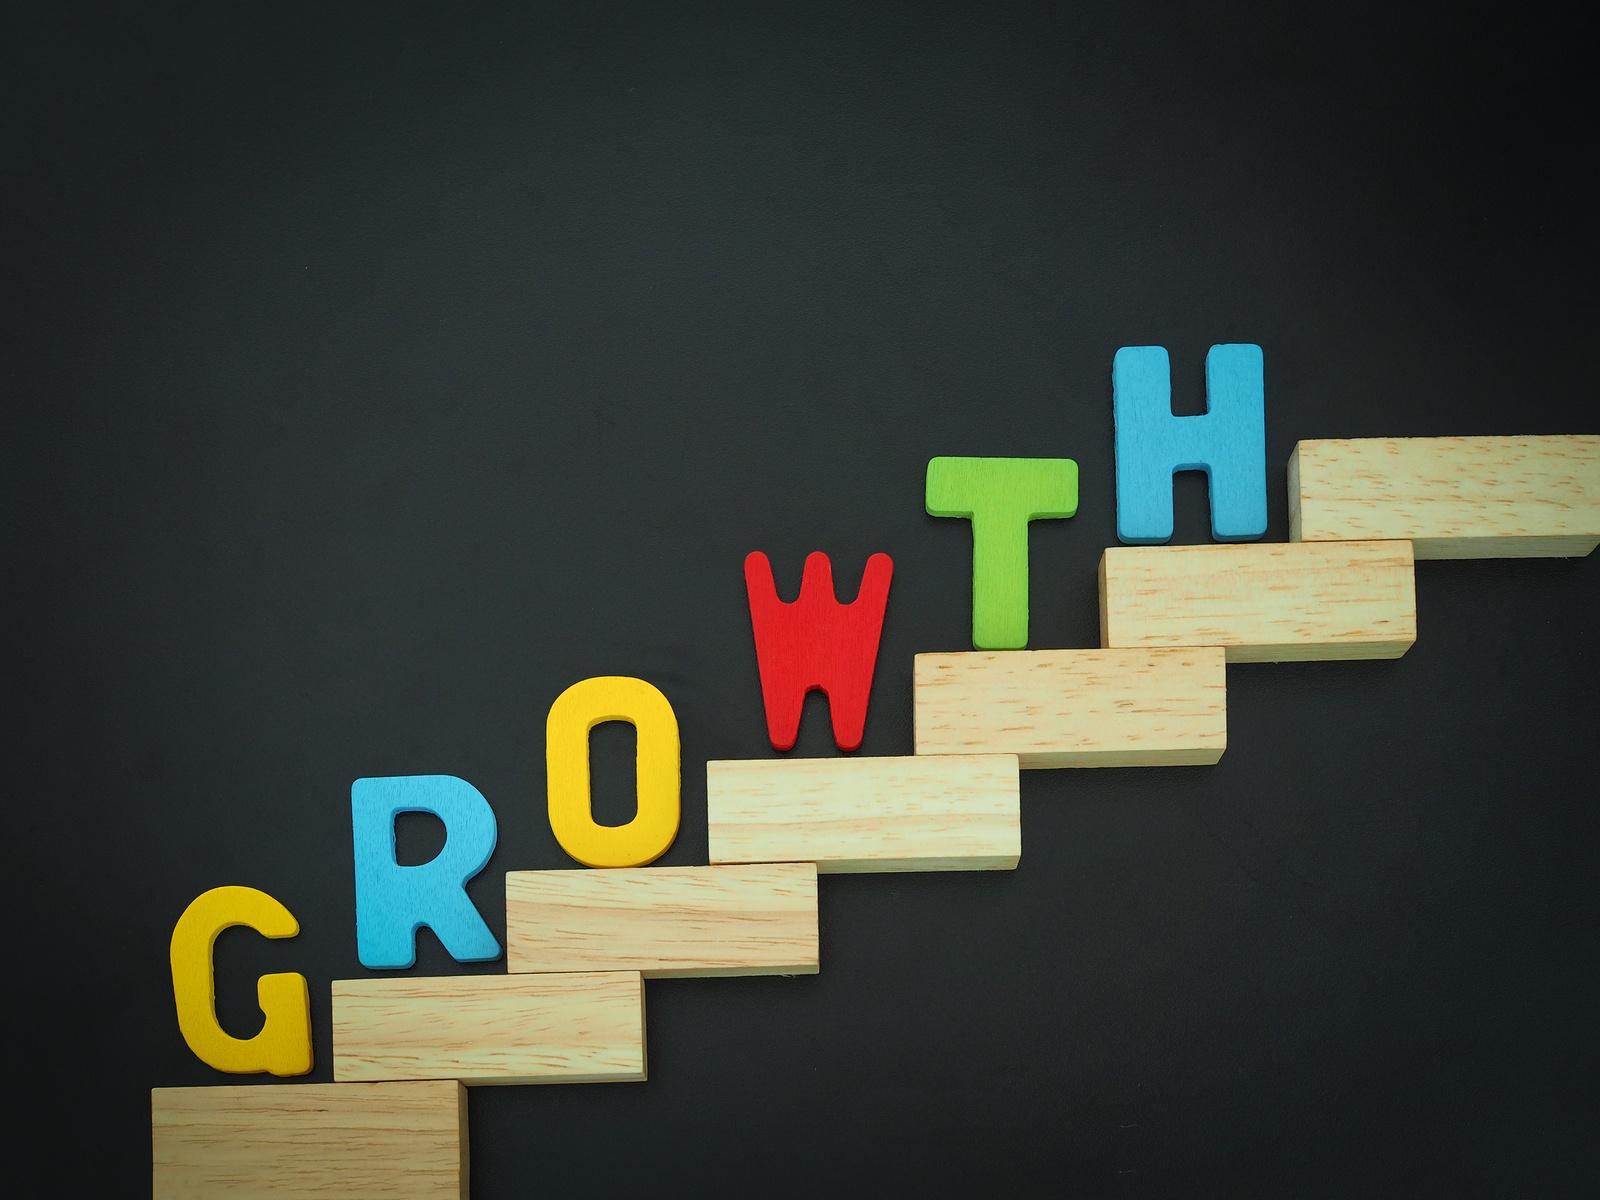 Growth with strategic advising